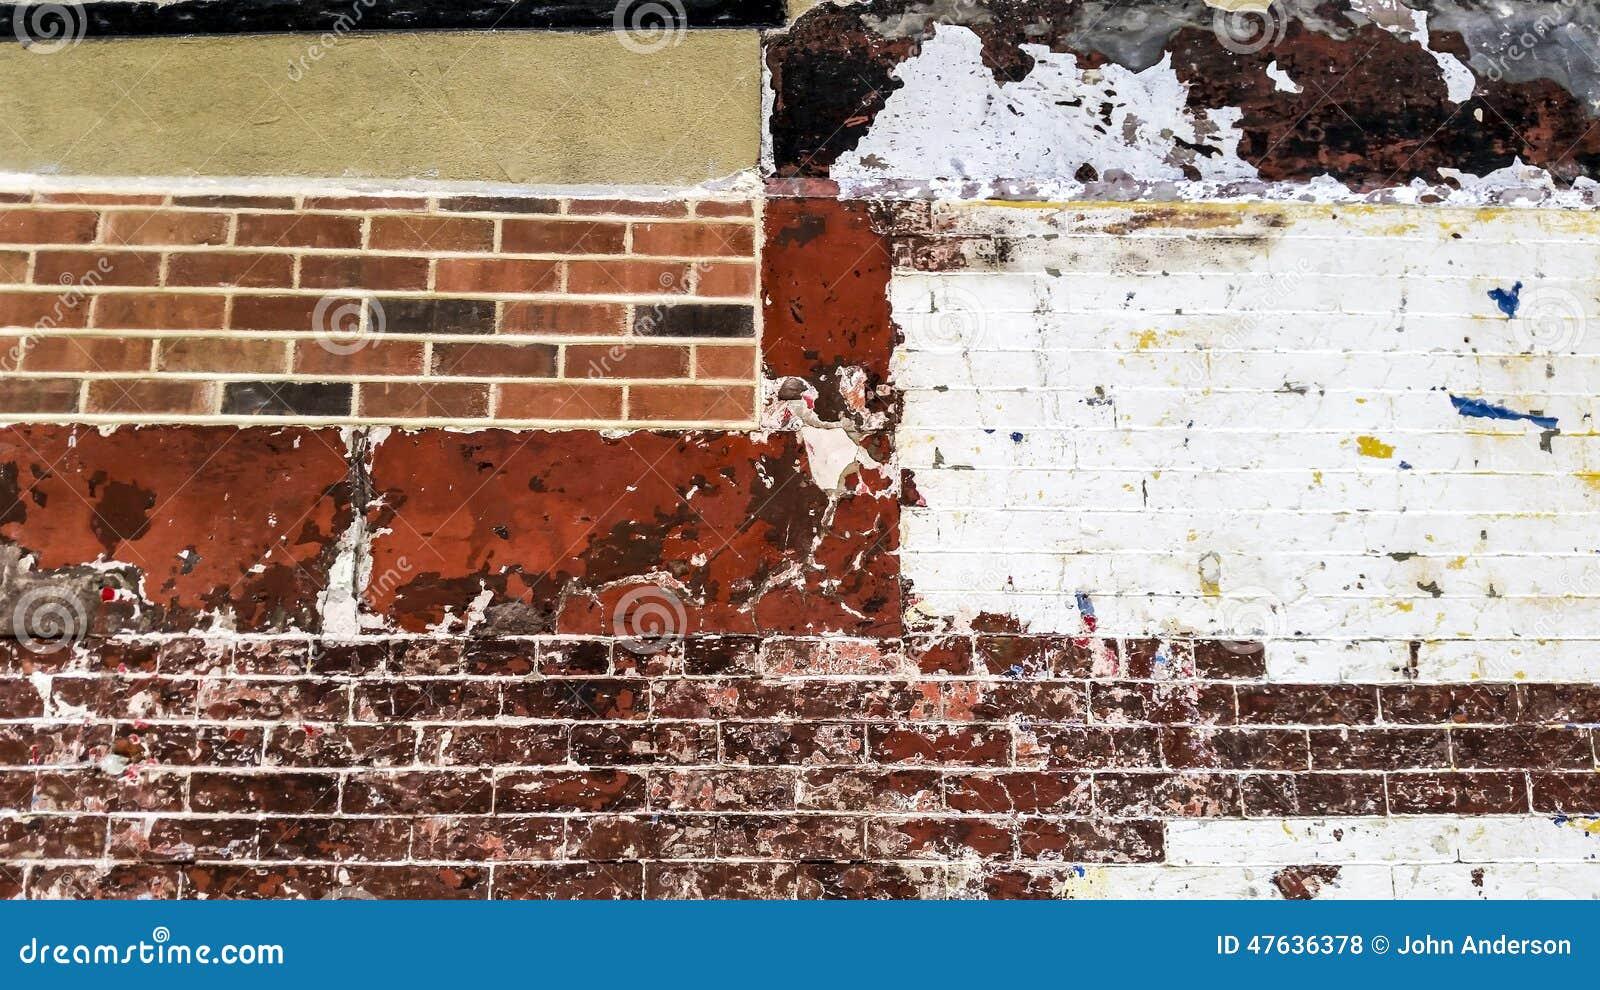 Brick Wall New York City Stock Photo - Image: 47636378